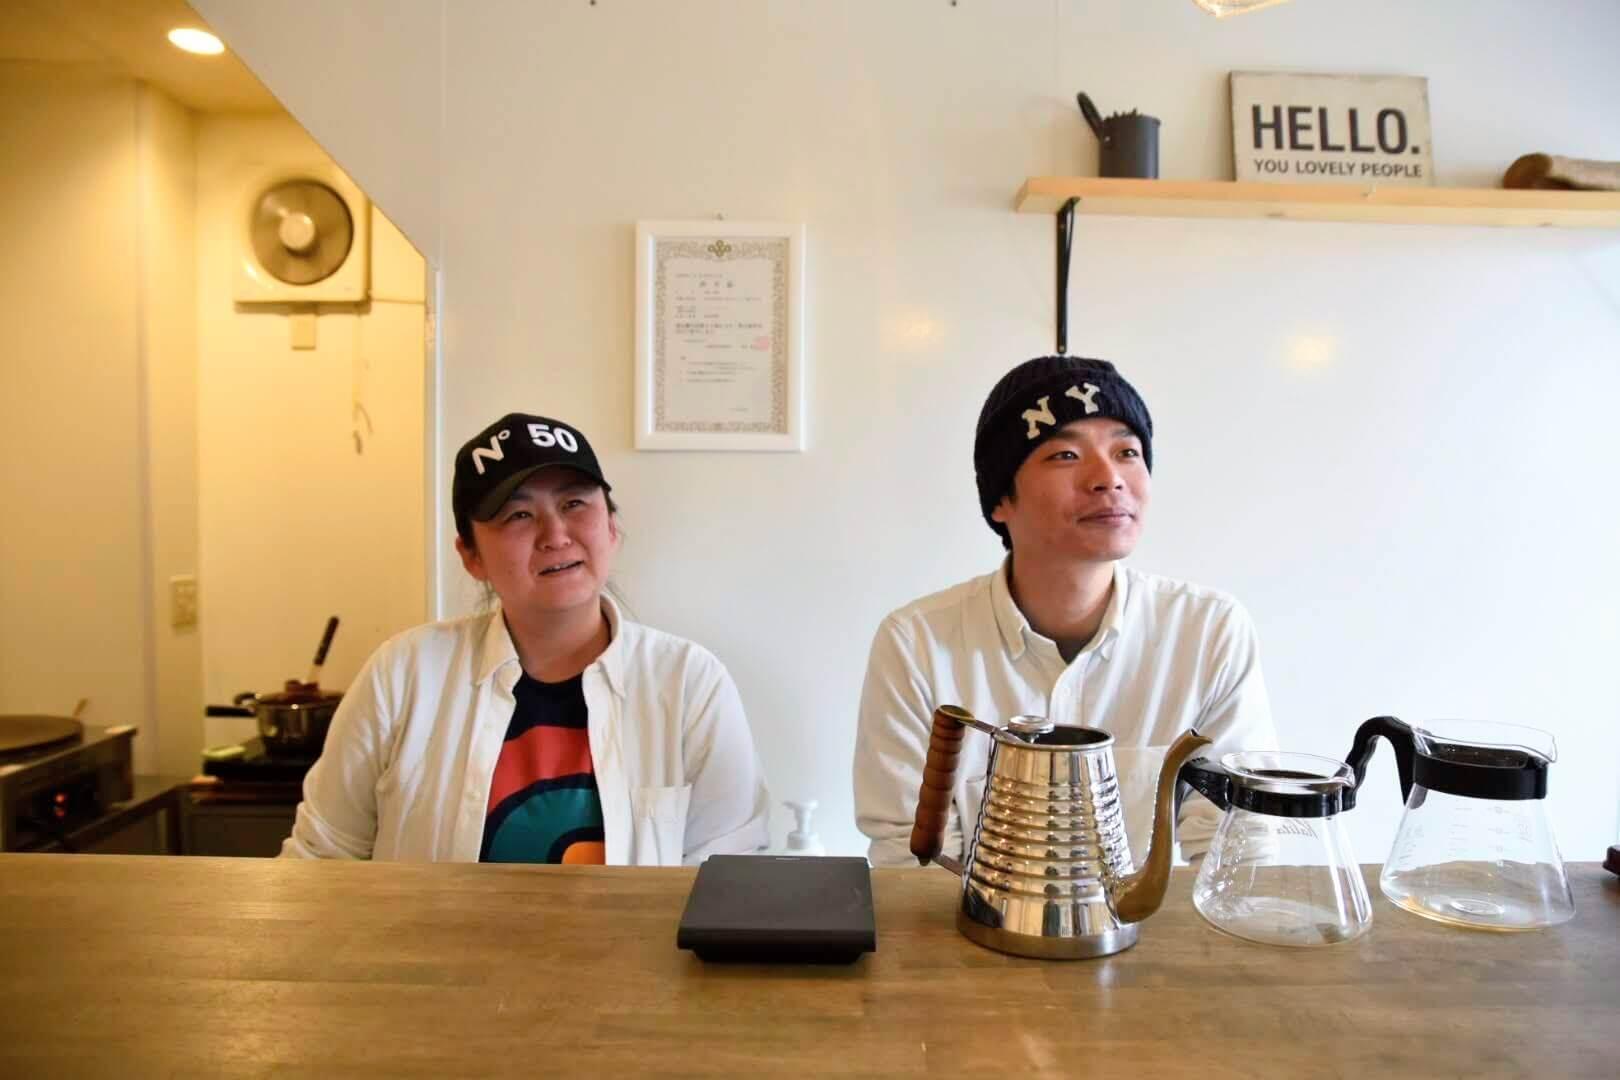 sri cafe夫婦にインタビュー